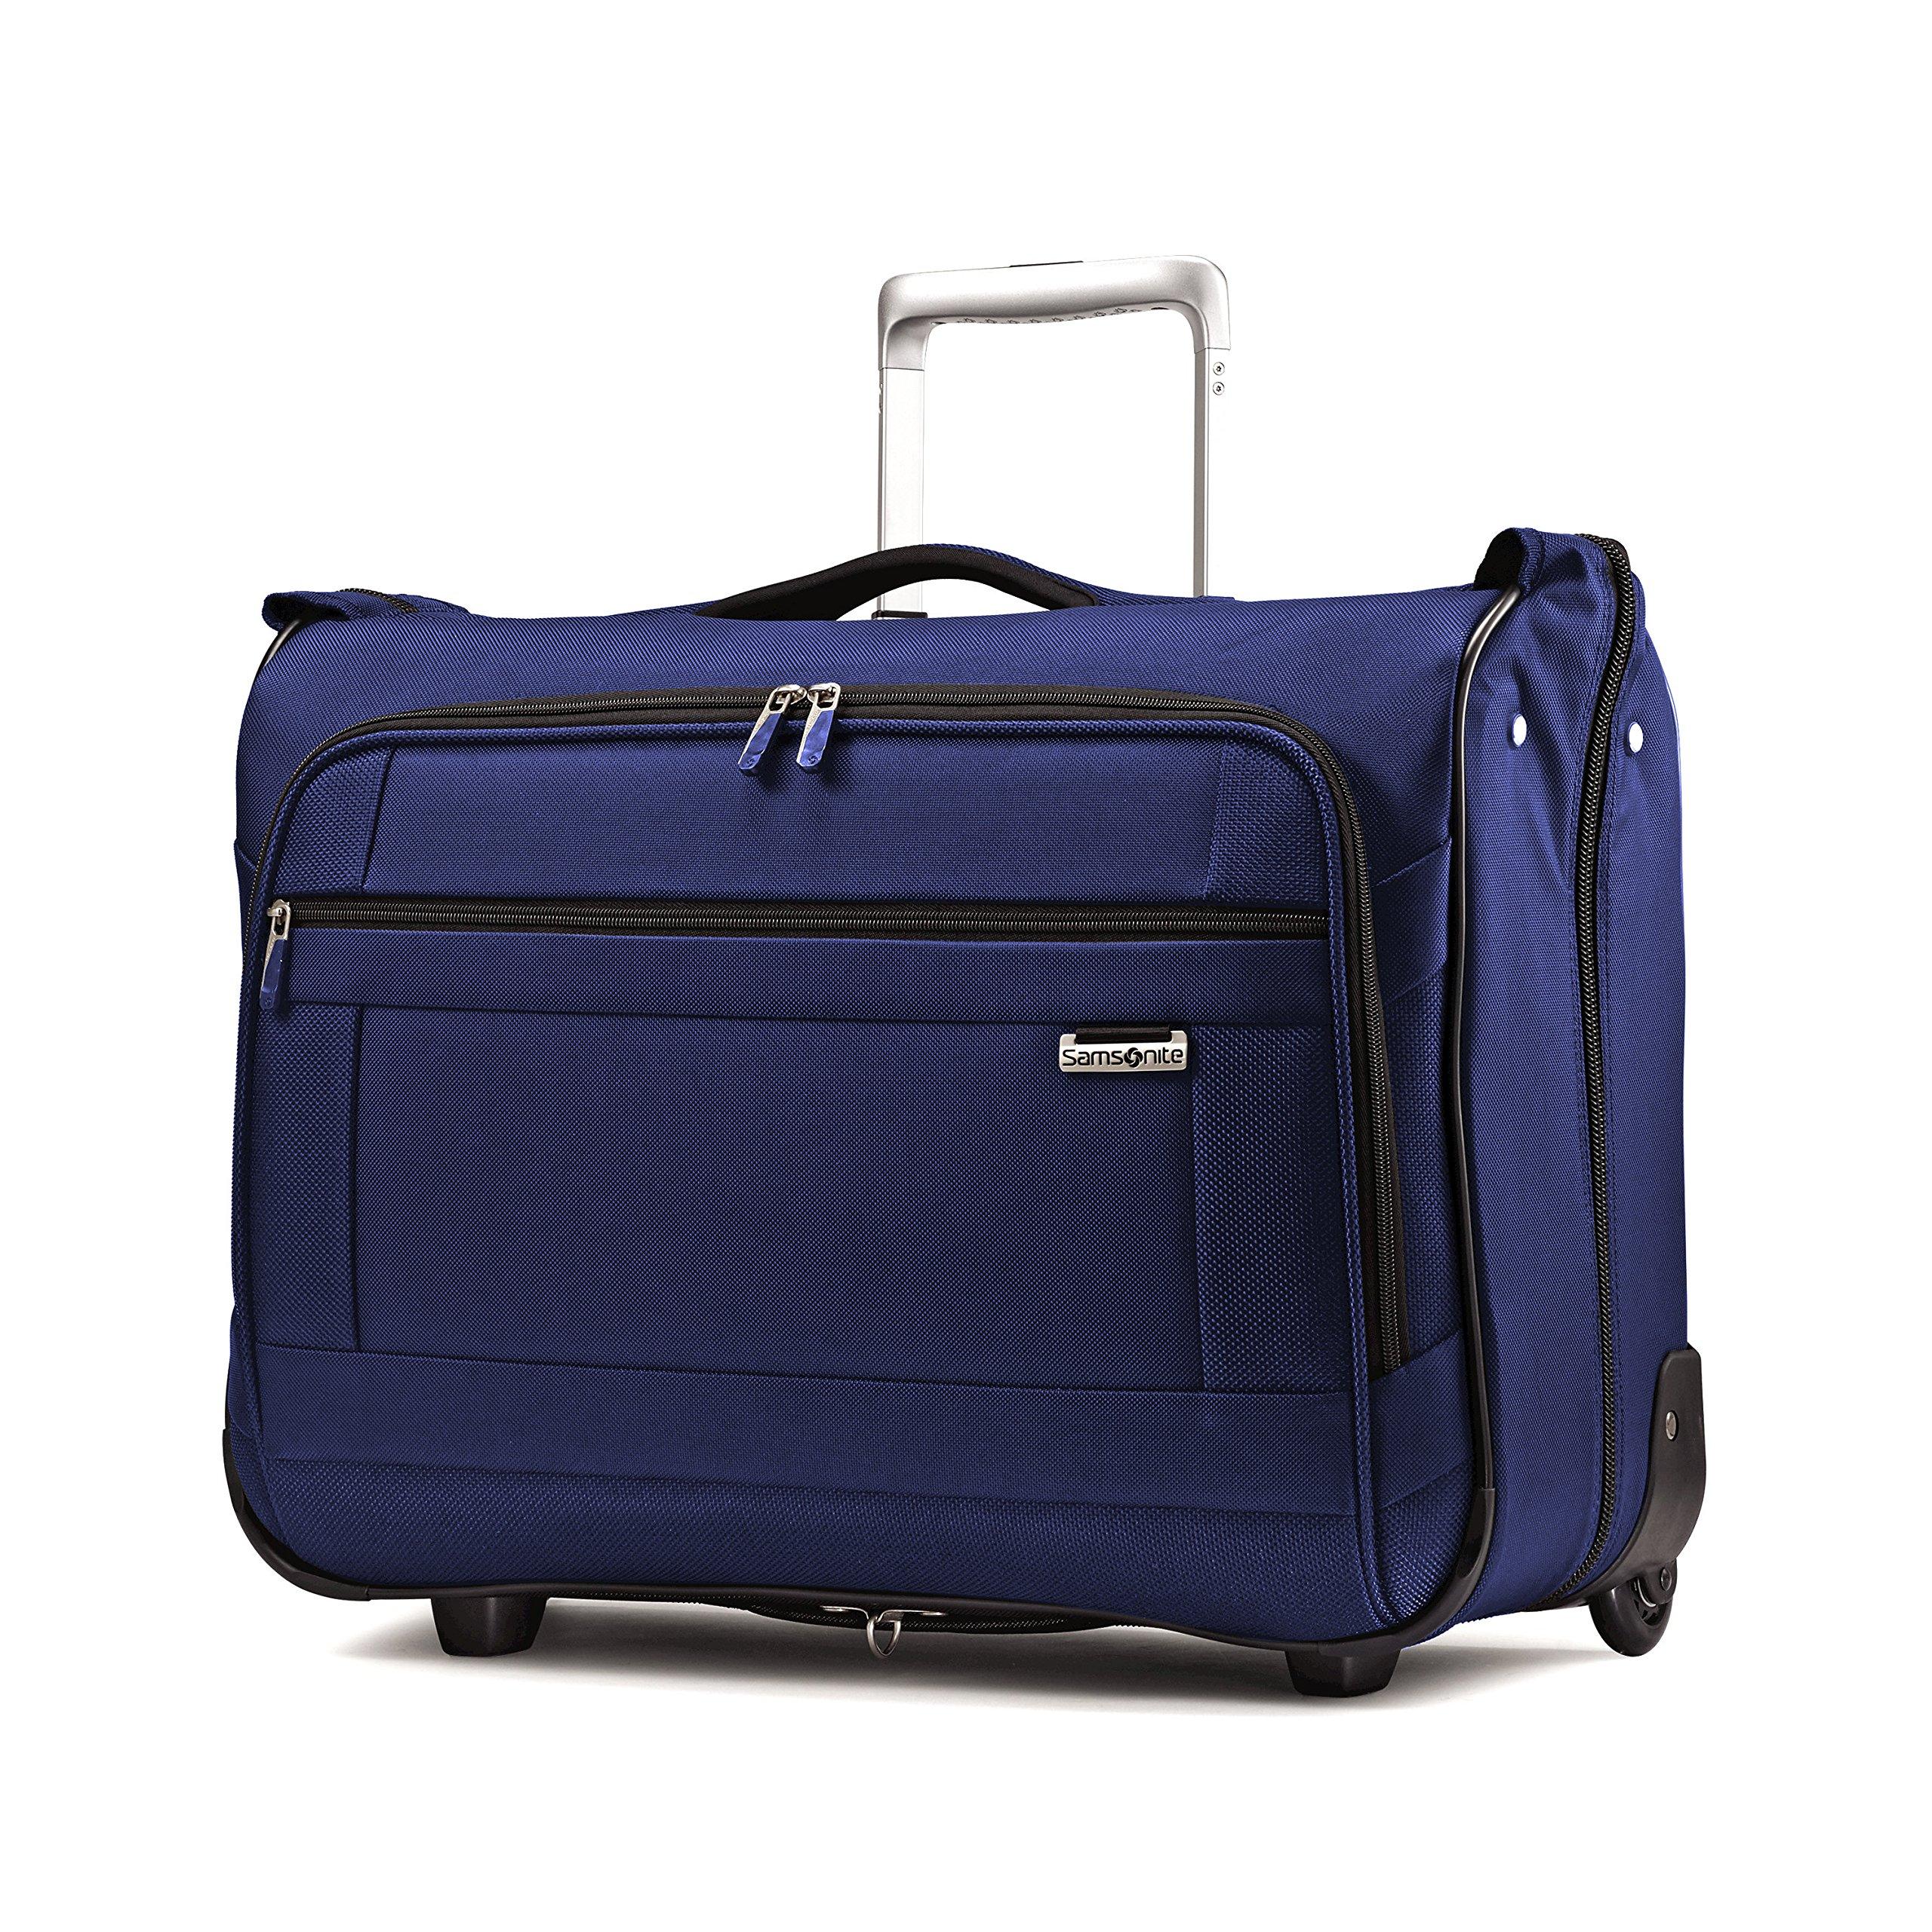 Samsonite Solyte Softside Carry-On Wheeled Garment Bag, Black (True Blue)